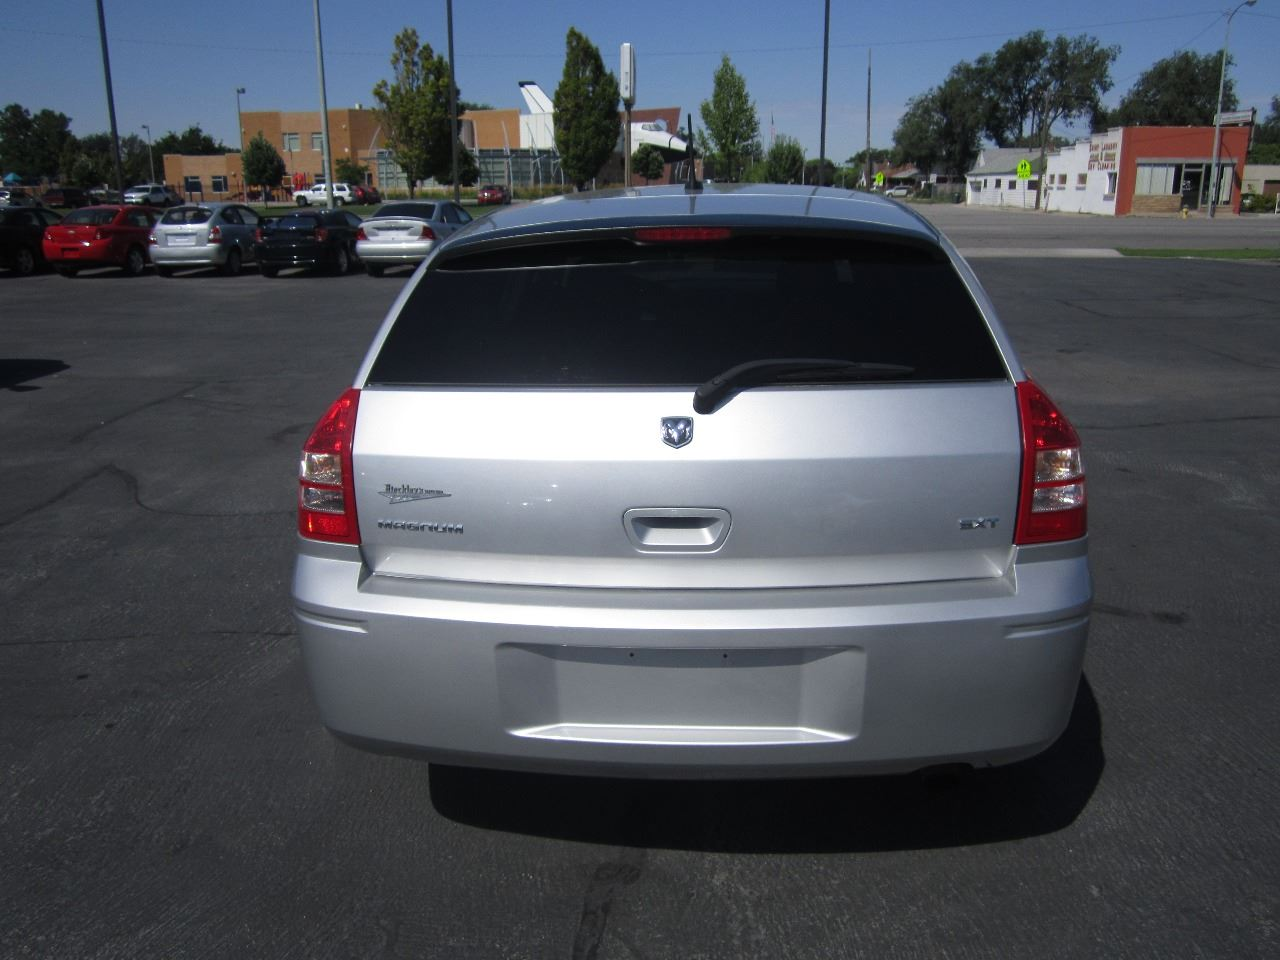 2008 Dodge Magnum SXT 4dr Wagon In Ogden UT - Smart Buy Auto